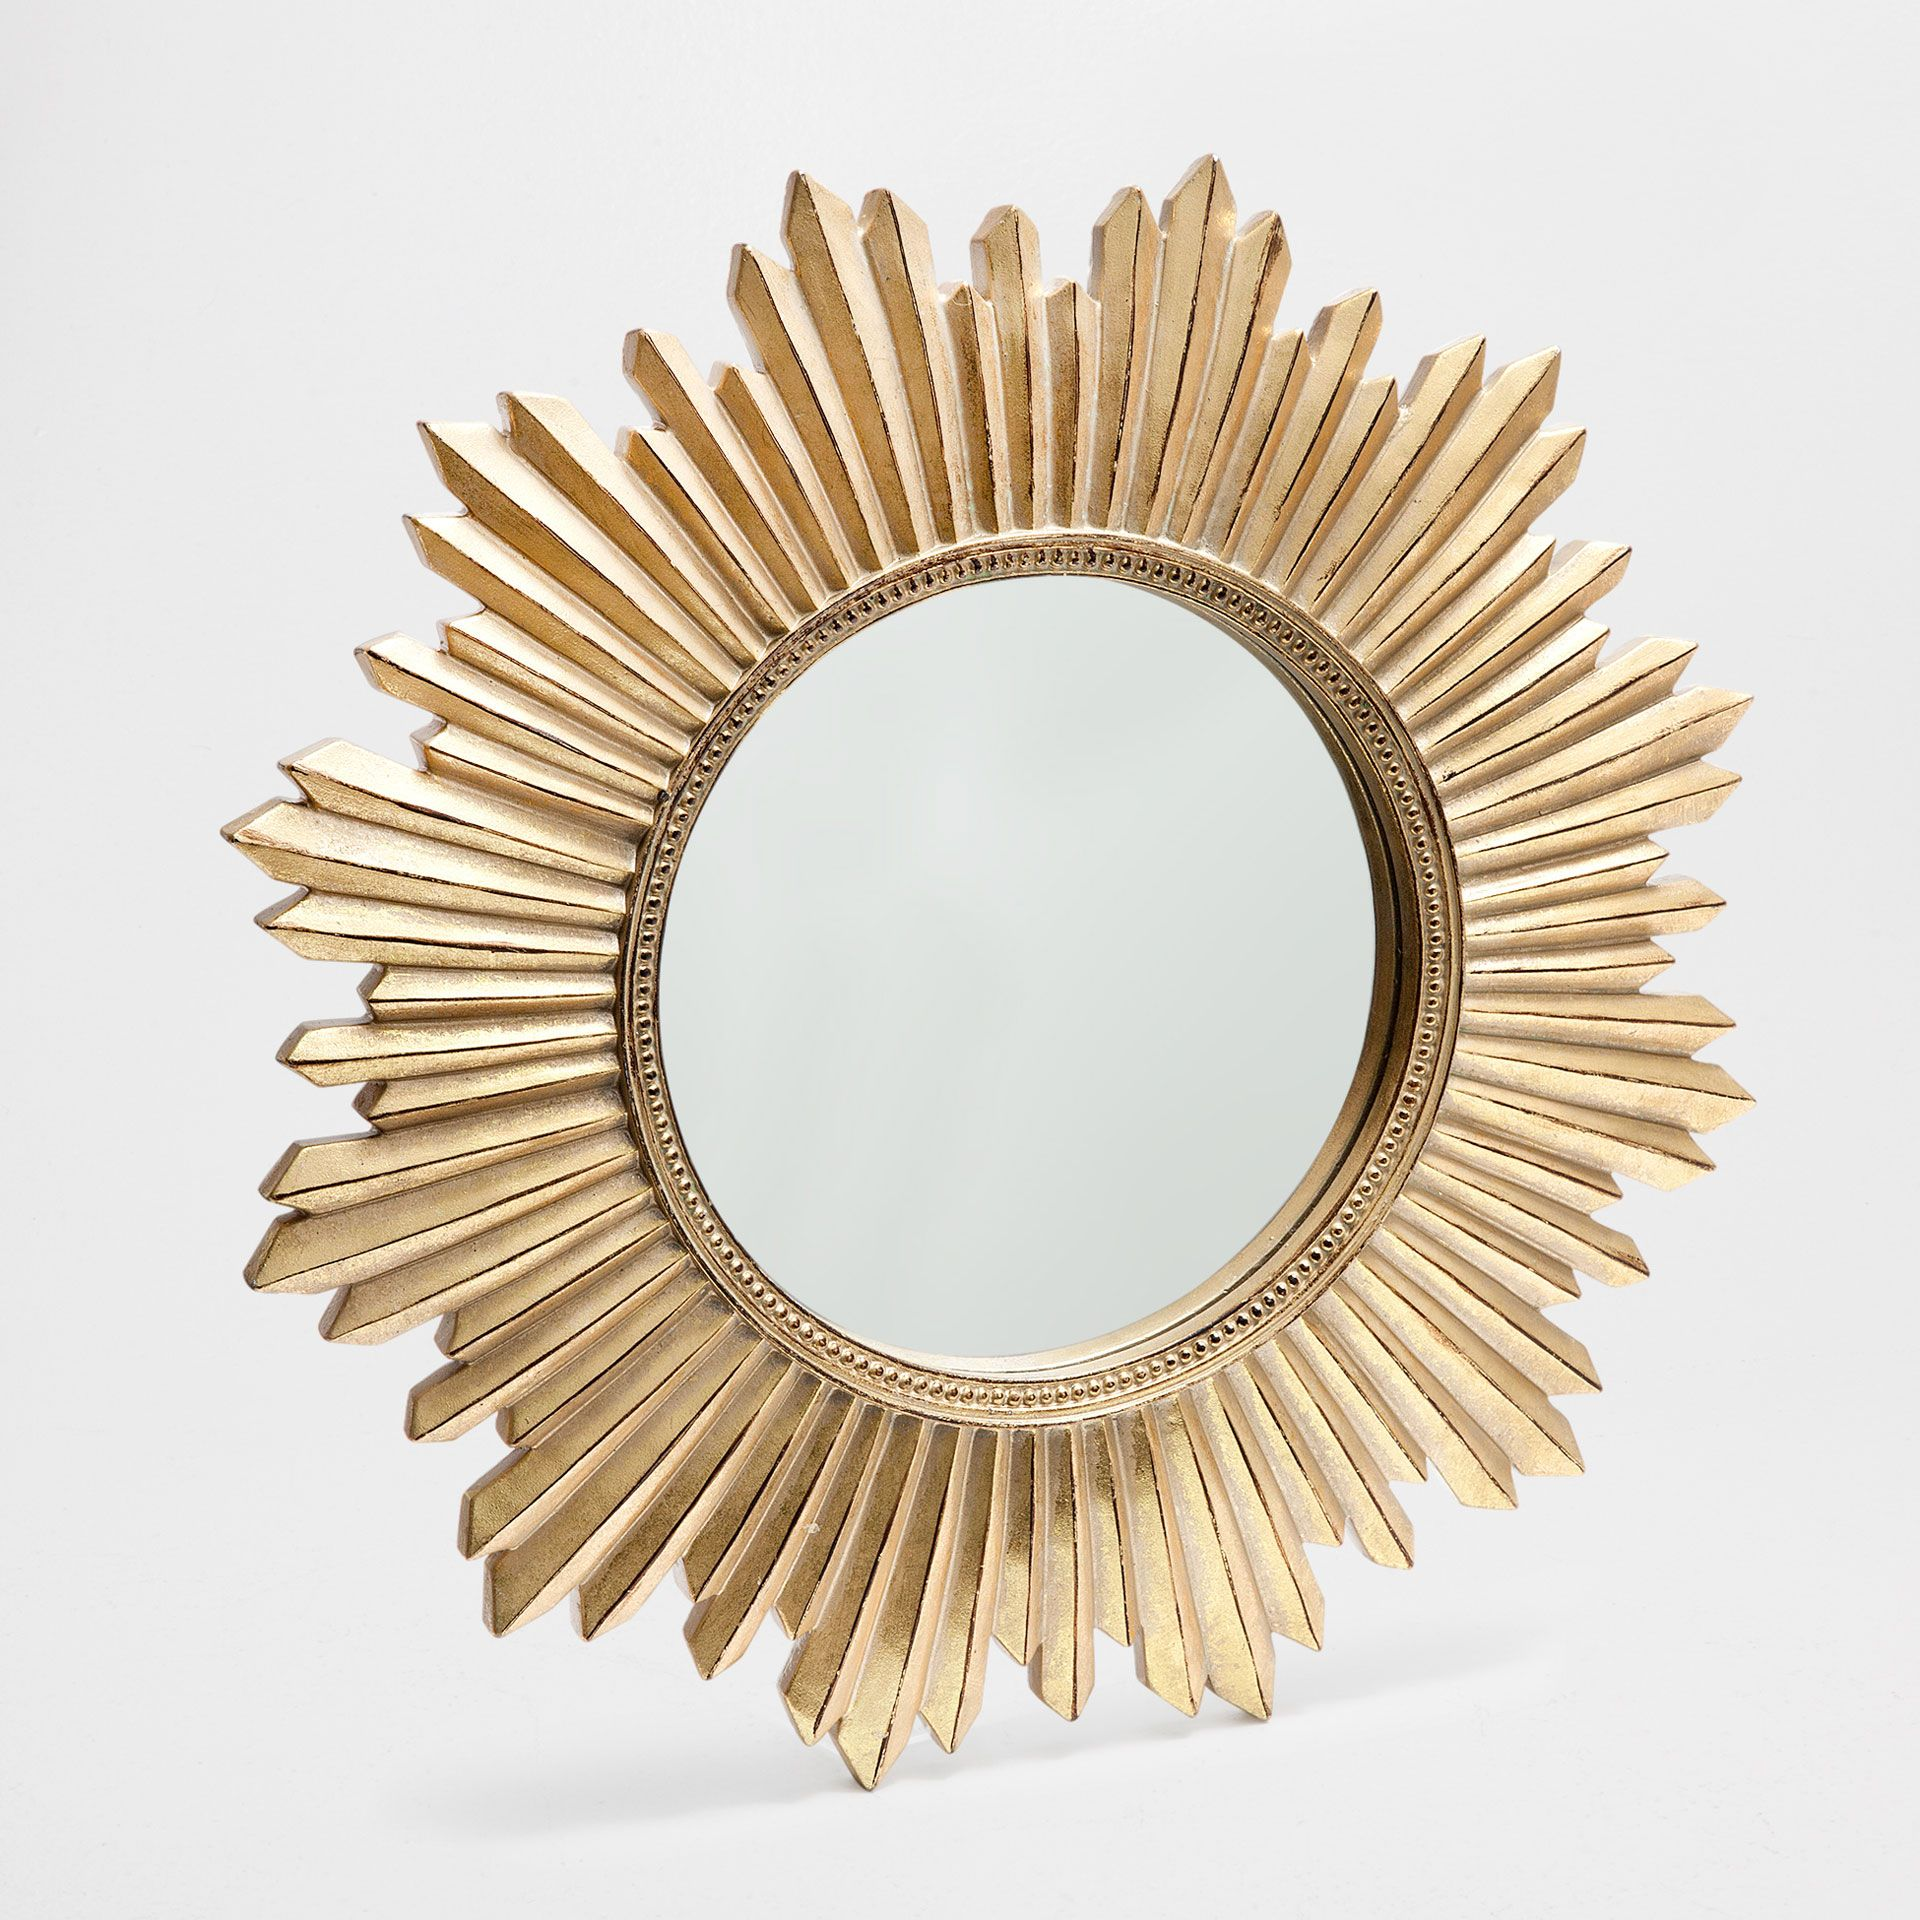 Feather Mirror | ZARA HOME Türkiye / Turkey | I t e m s ...